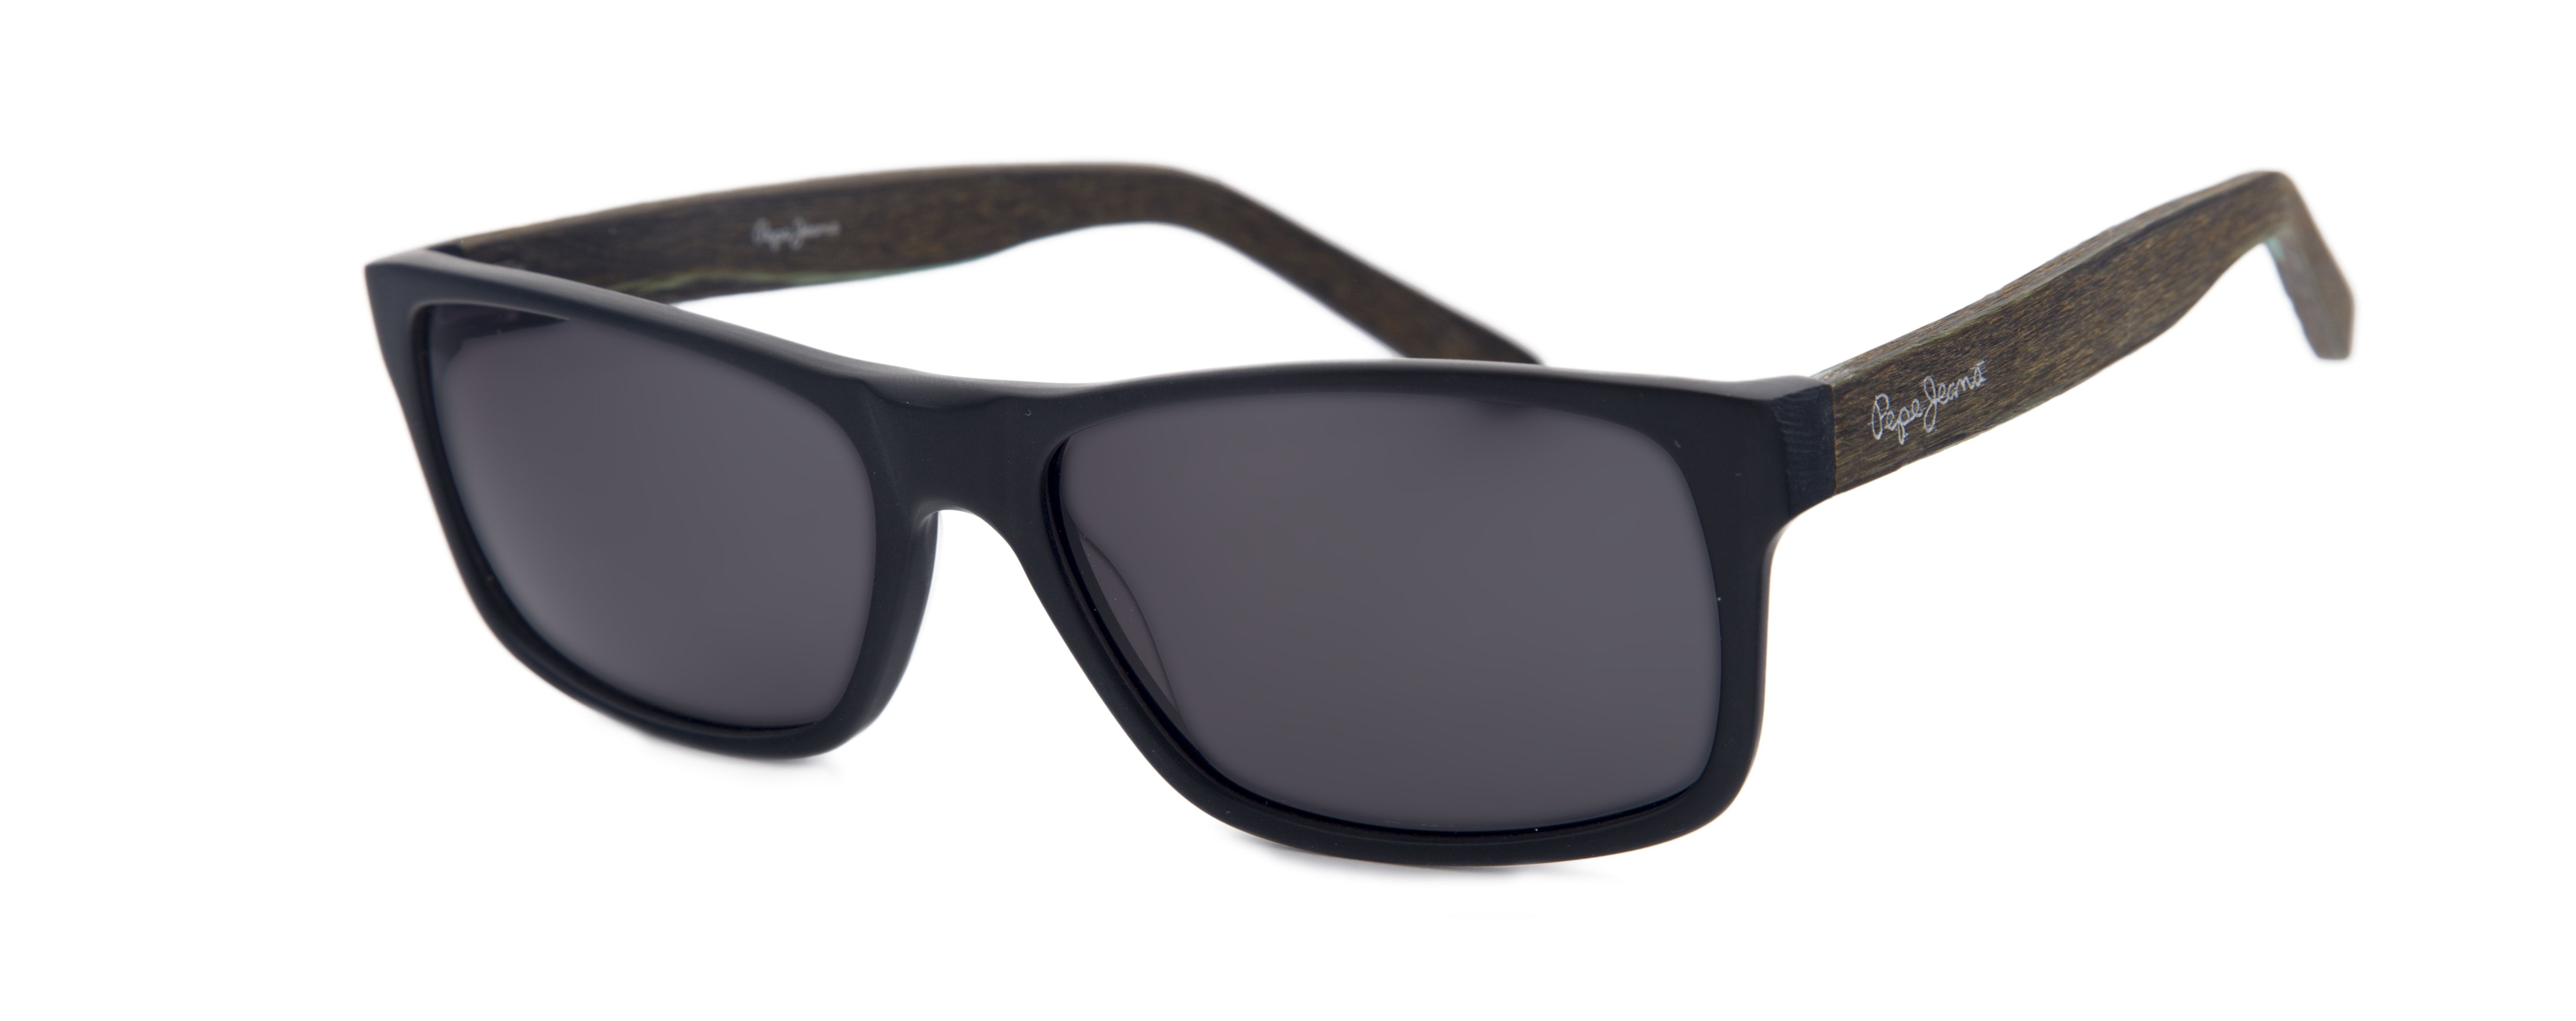 8ffb621cf3 Gafas de sol Pepe Jeans para Opticalia. Modelo para hombre en color negro.